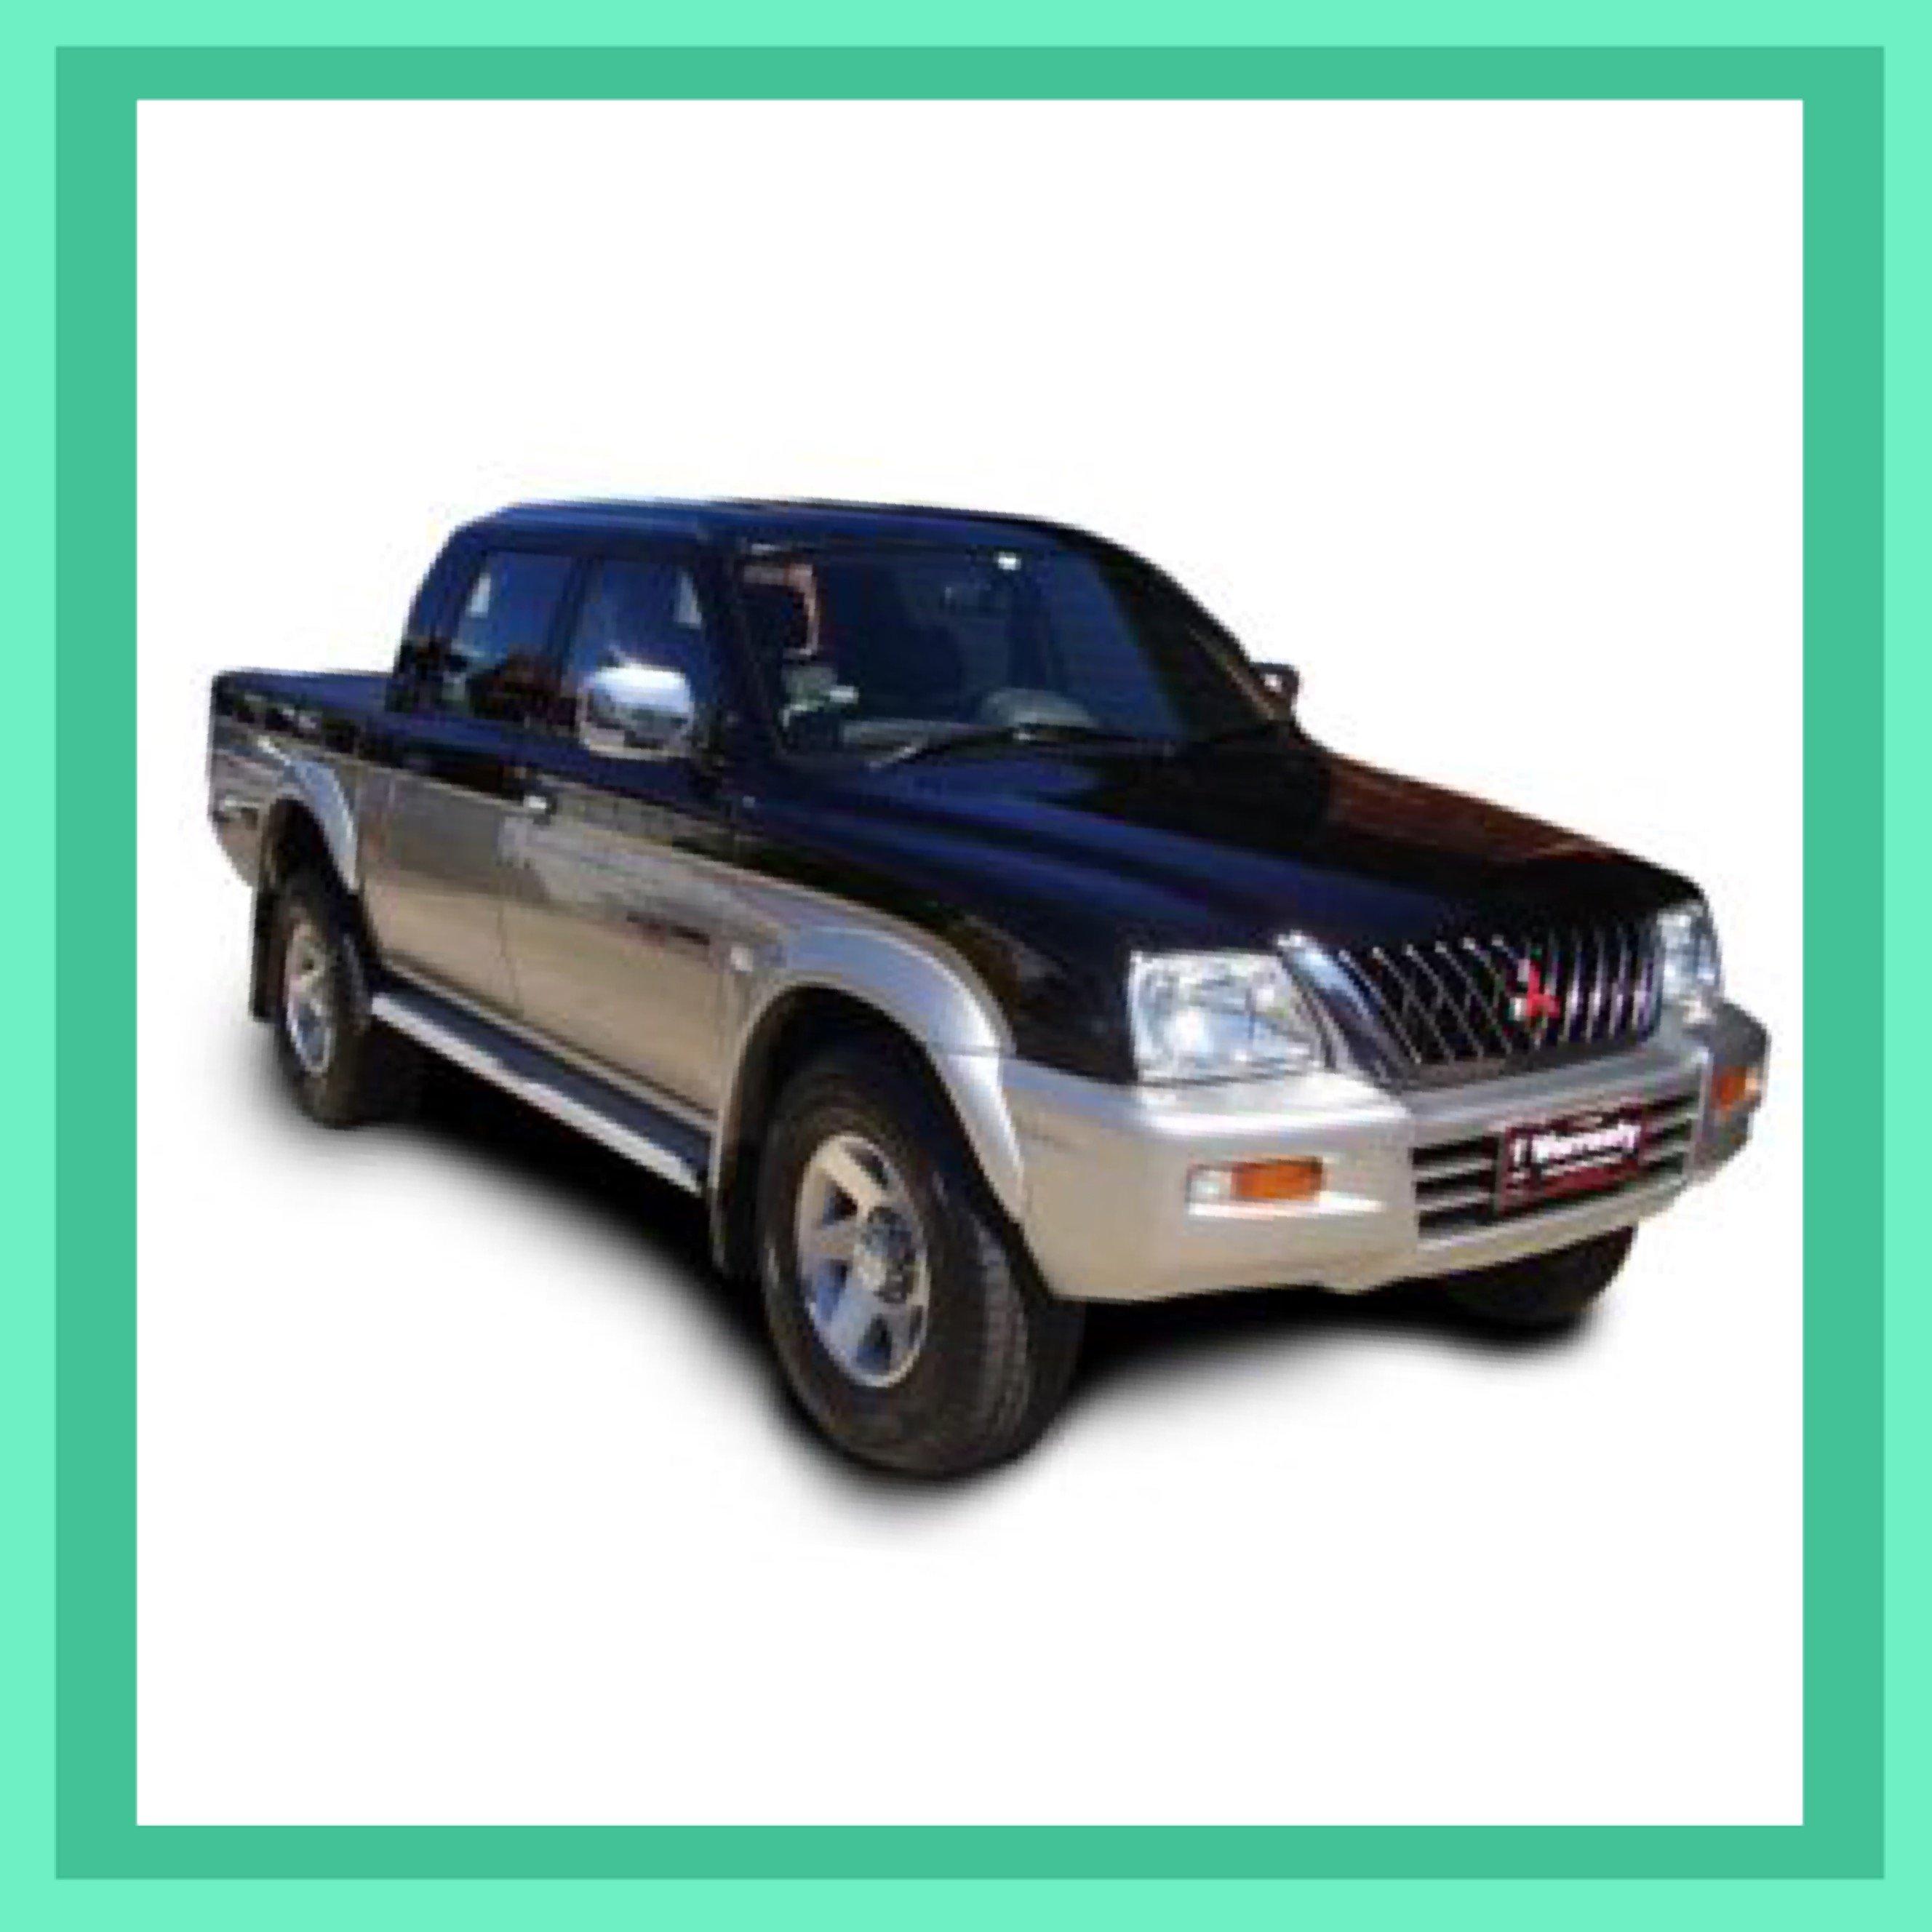 Mitsubishi Triton Car Key and Remote, Suit MK 2002 - 2007